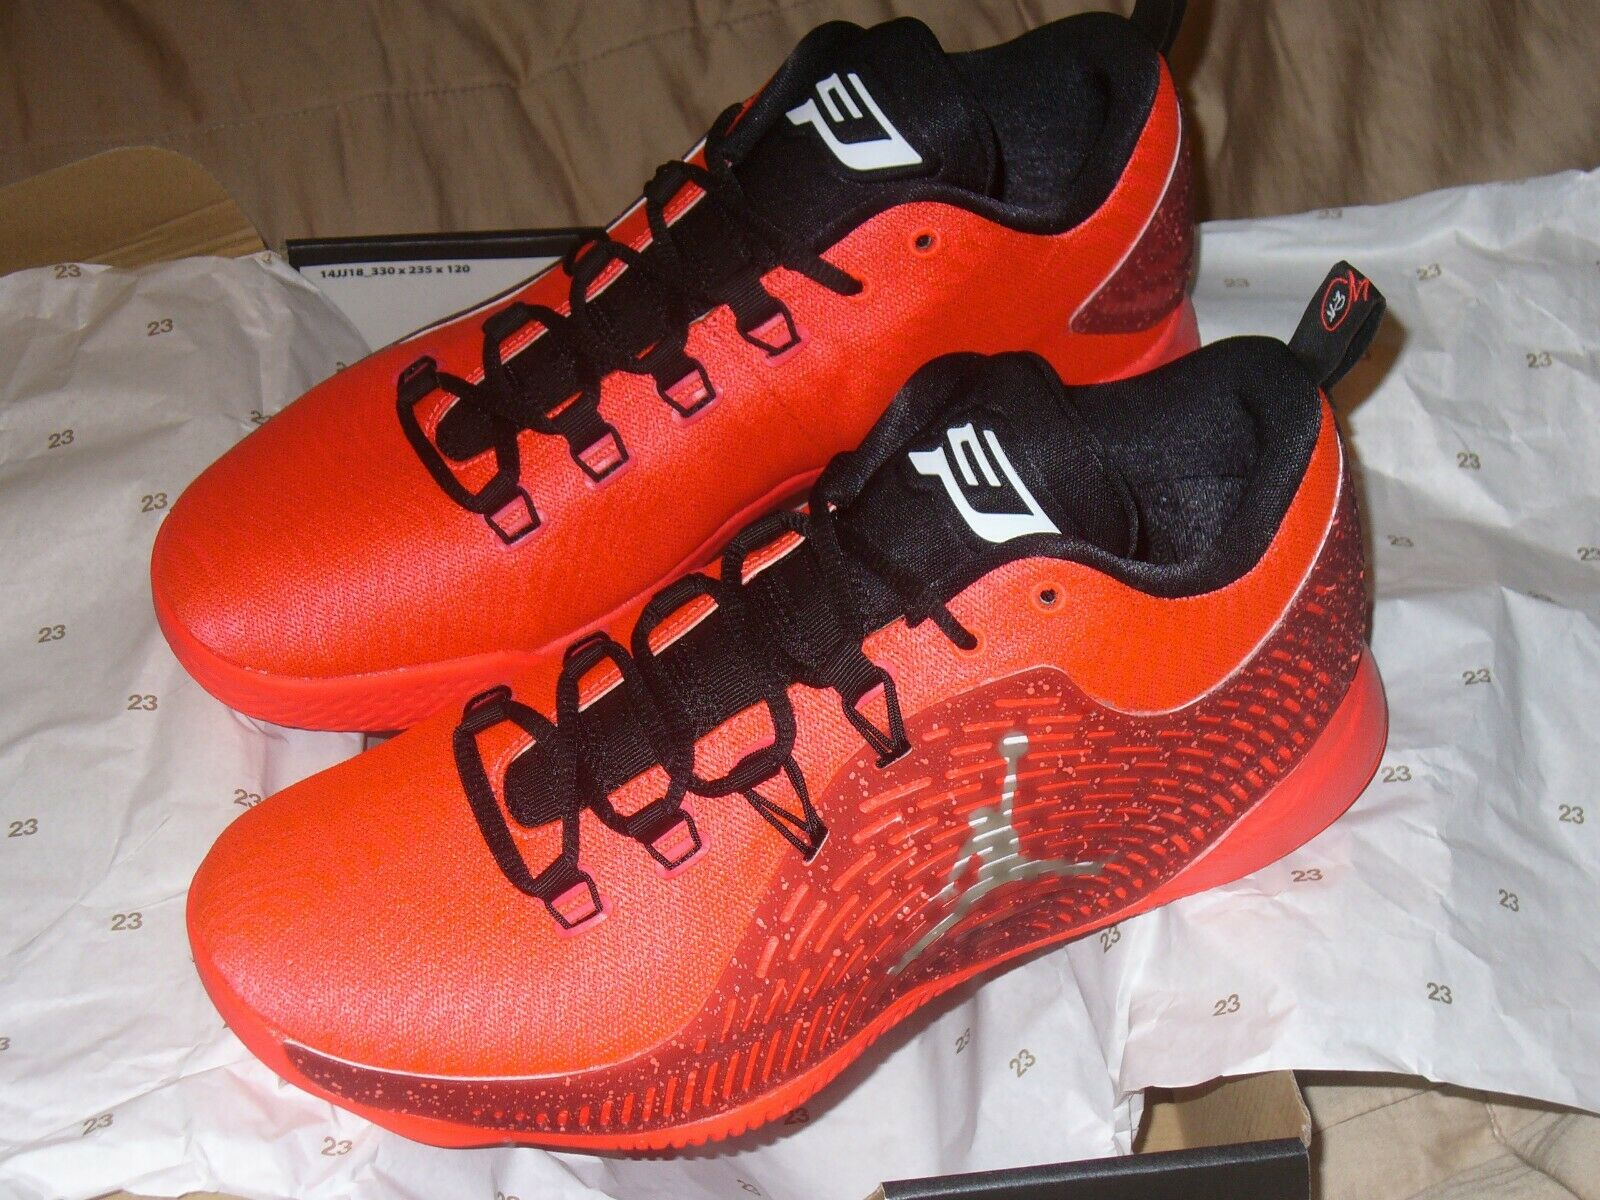 Nike Jordan CP3 X 10 Infrarojo Air 23 Rojo Negro Chris Paul 854294 600 tamaño 10D NWB